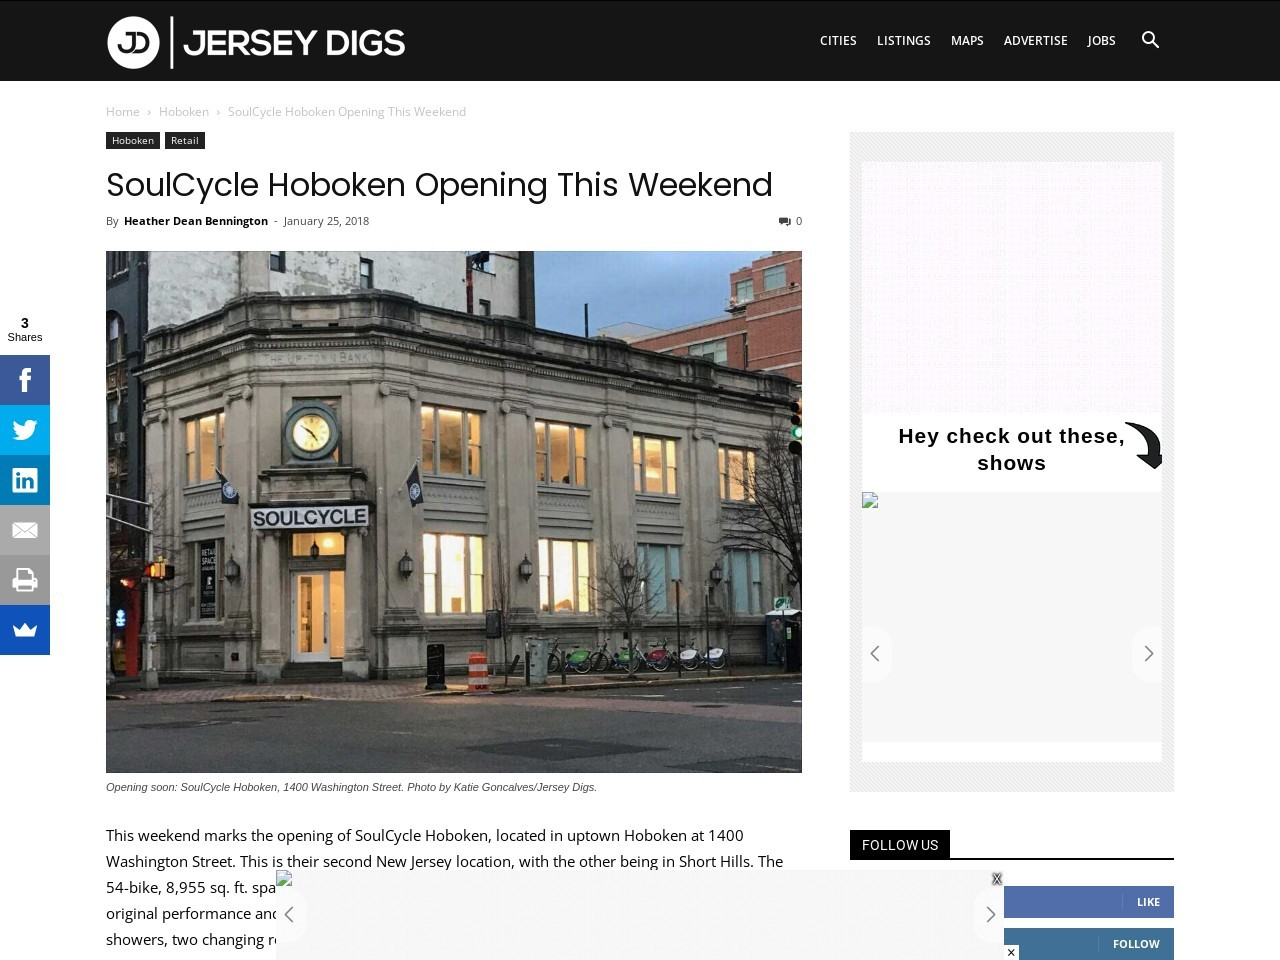 SoulCycle Hoboken Opening This Weekend